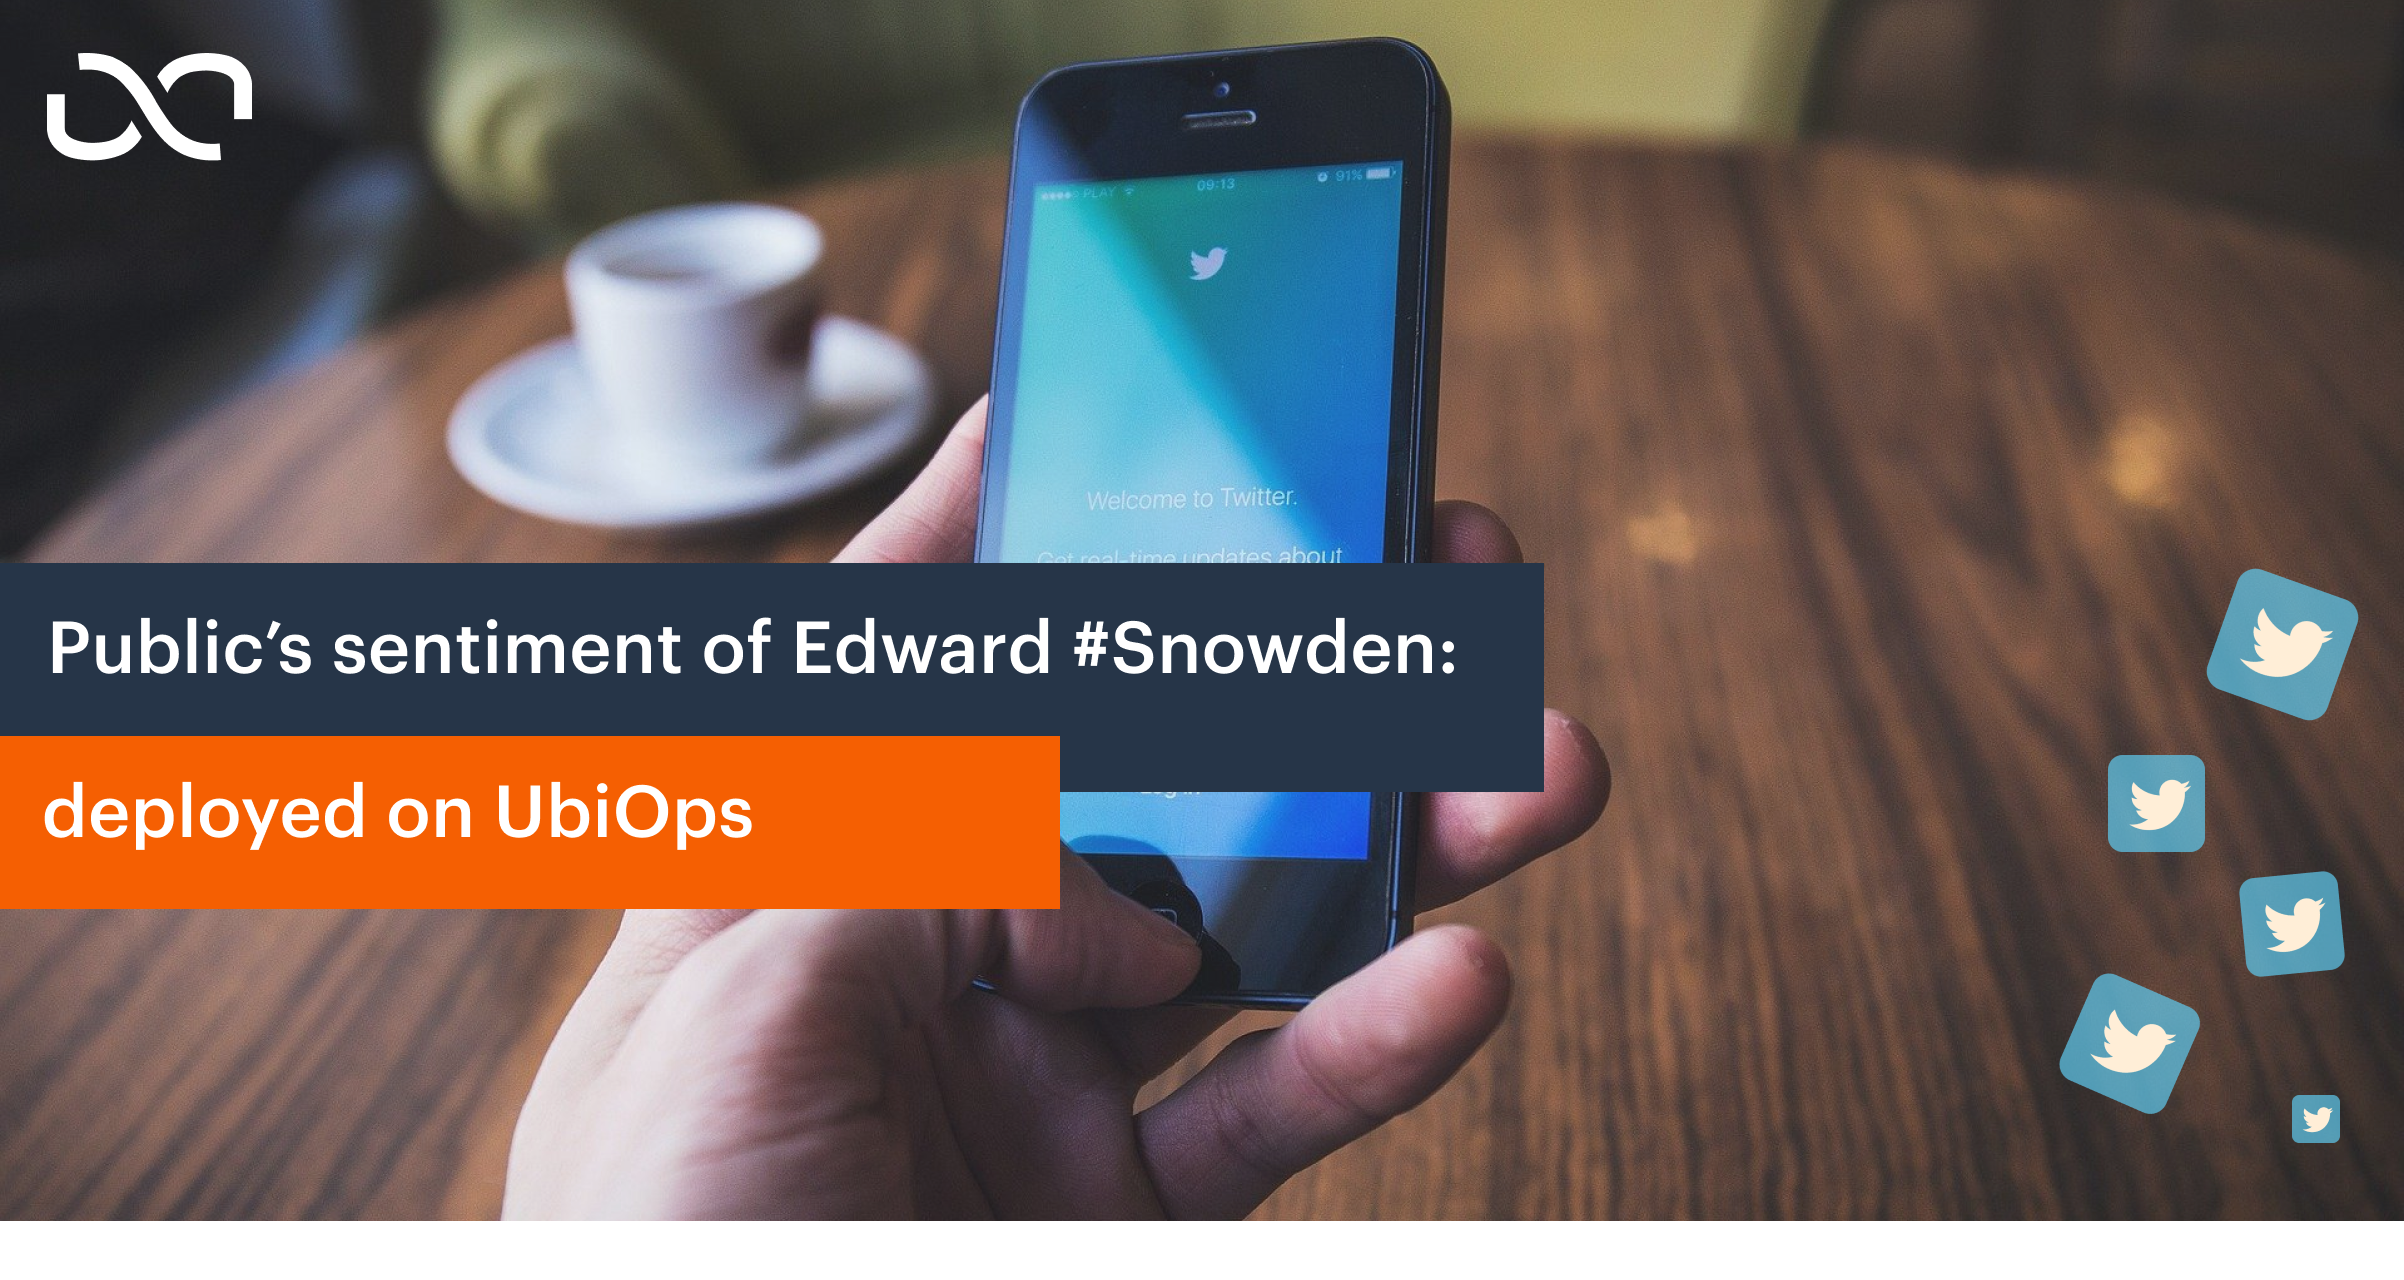 Public's sentiment of Edward #Snowden: deployed on UbiOps